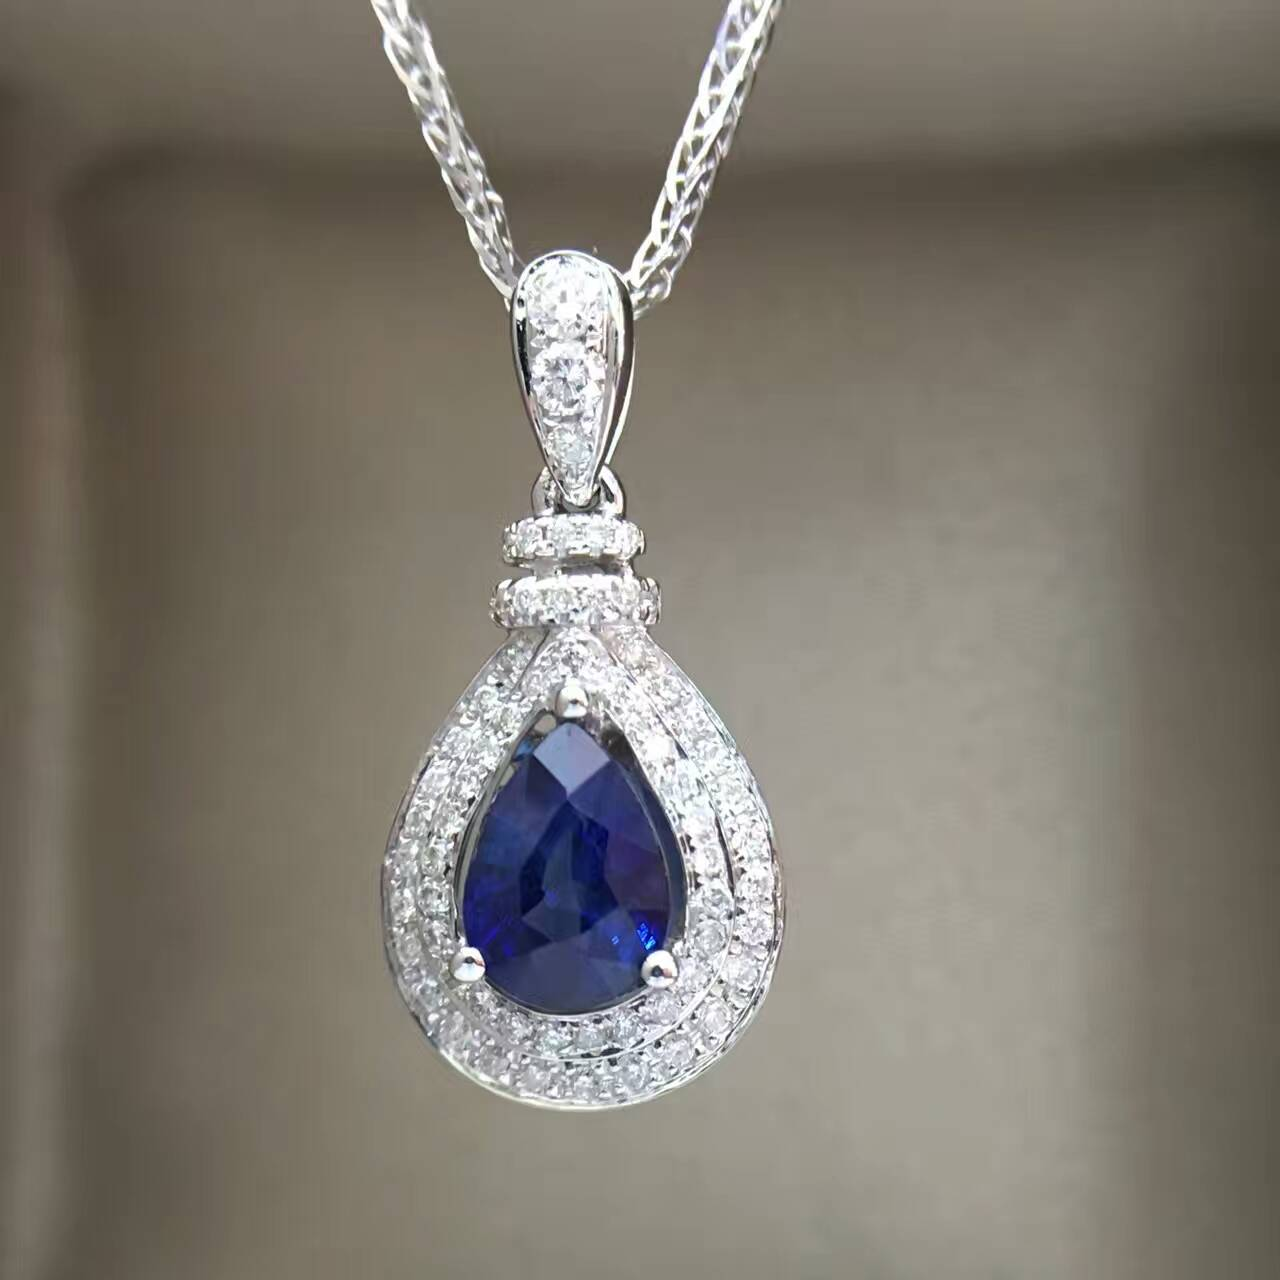 Starfield 18 k ouro branco 0.23 quilates de diamante incrustado sri lanka 0.93 quilates safira feminino pingente colar com corrente certificada